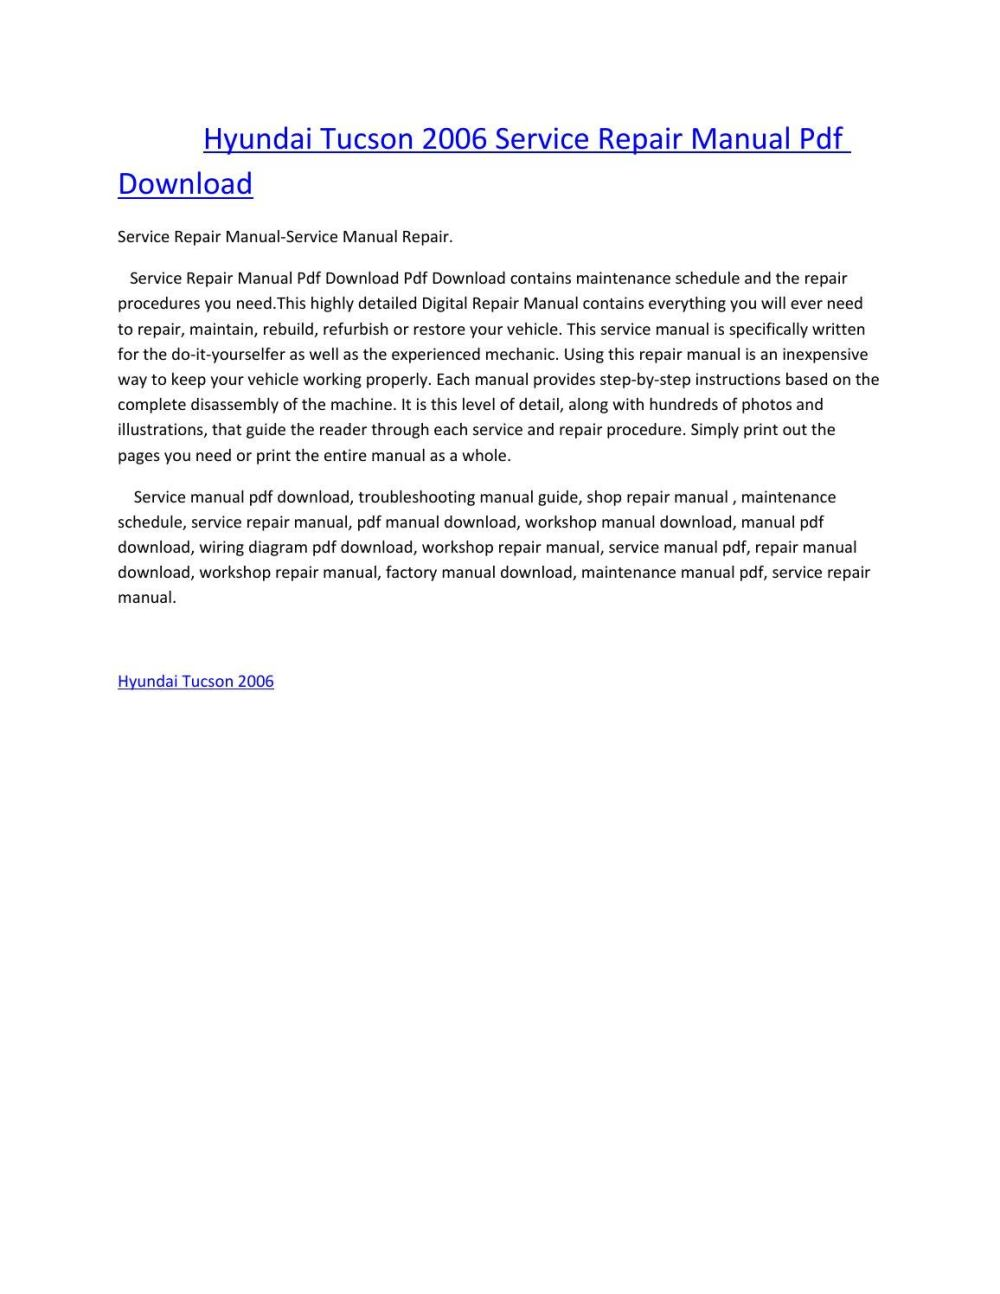 medium resolution of hyundai tucson 2006 service manual repair pdf download by amurgului issuu